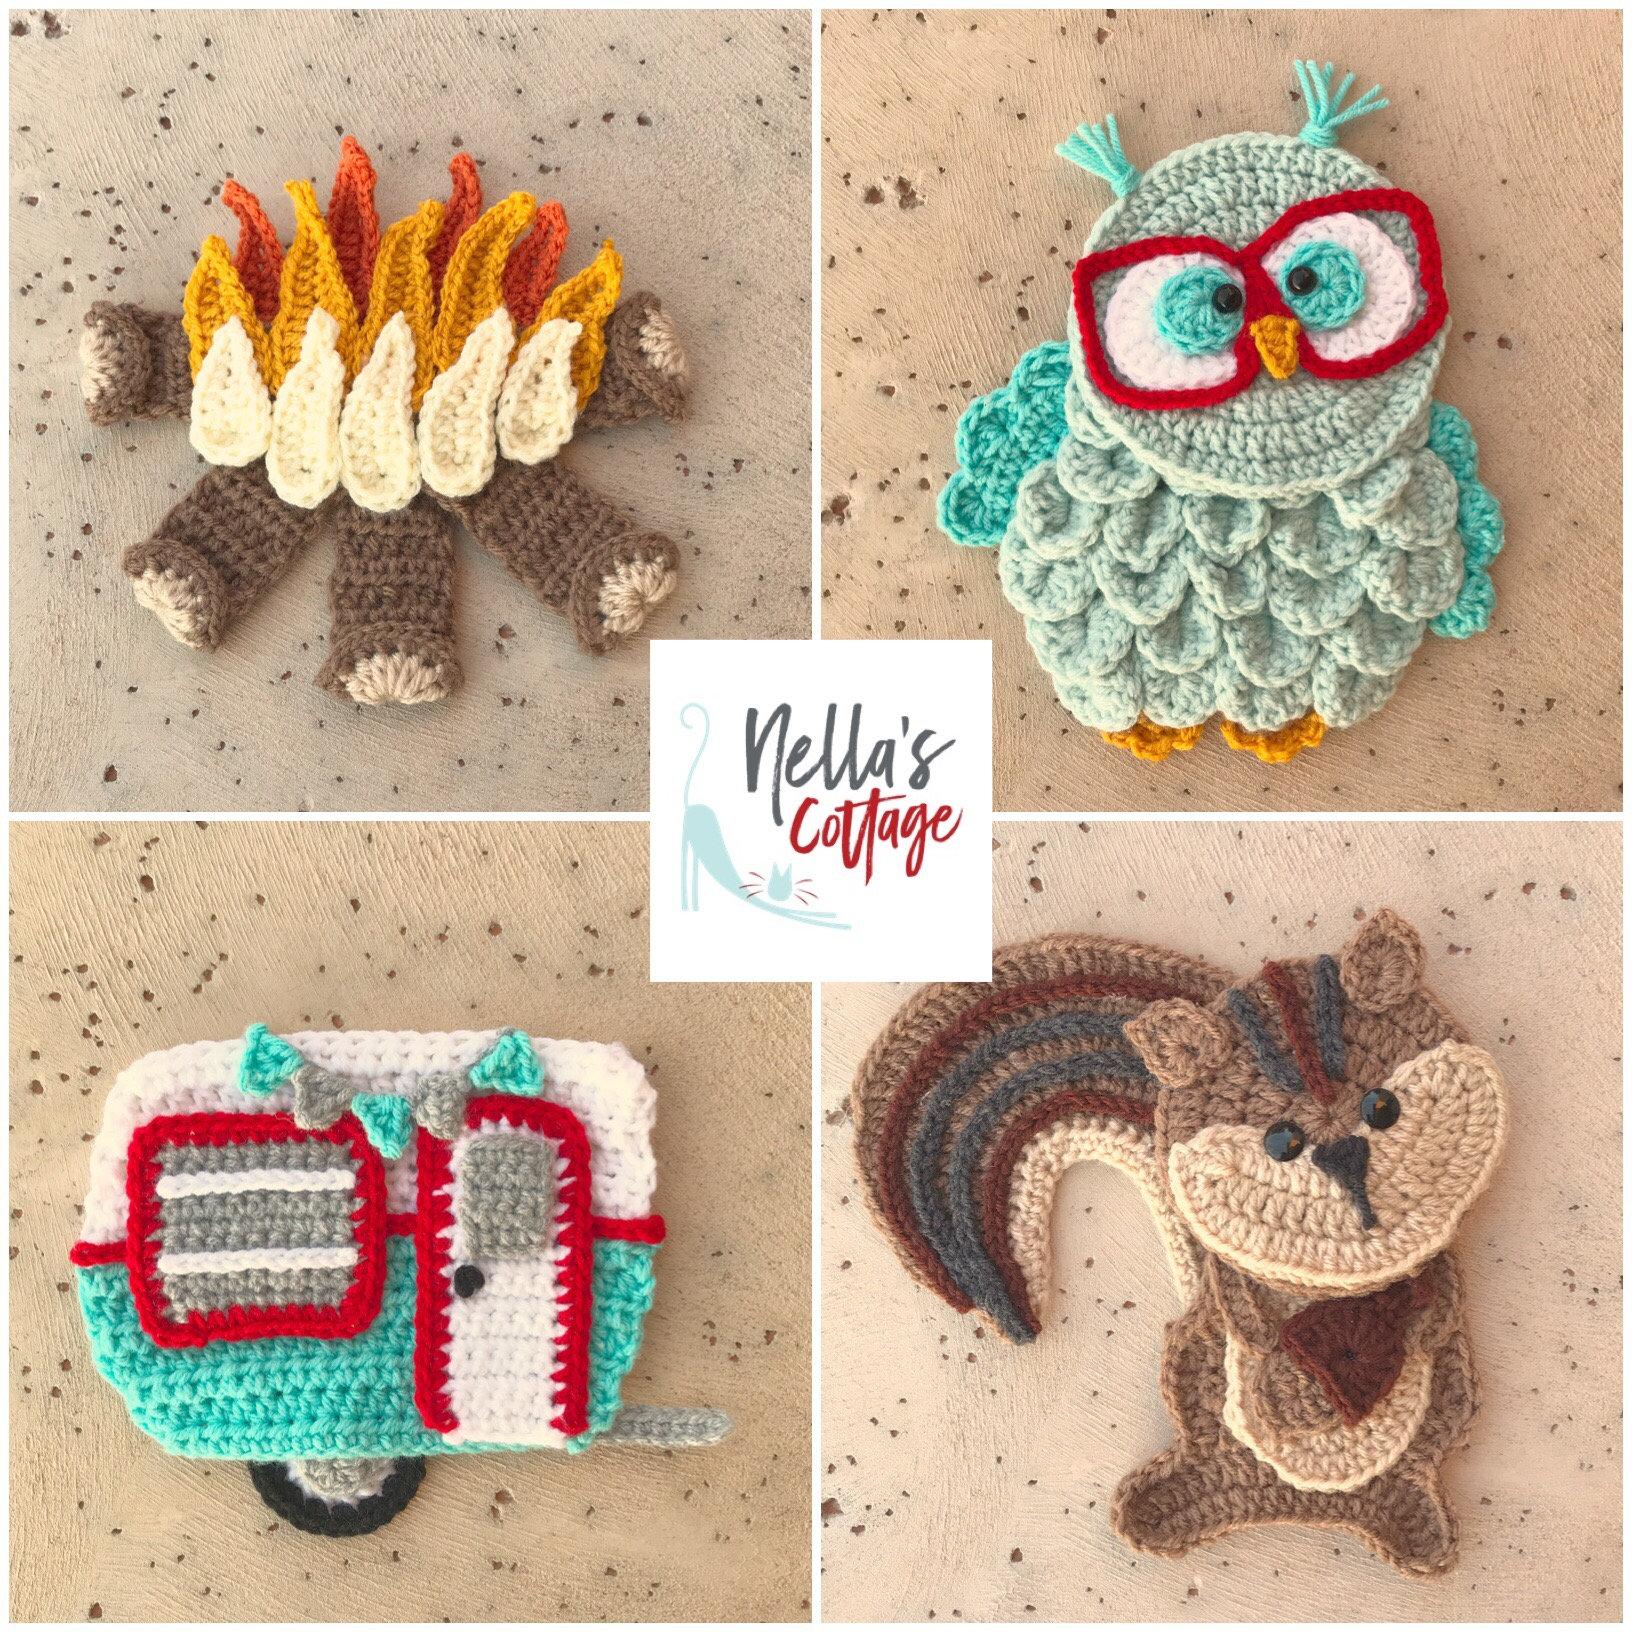 Crochet Pattern Instant Pdf Download Crochet Patterns Etsy